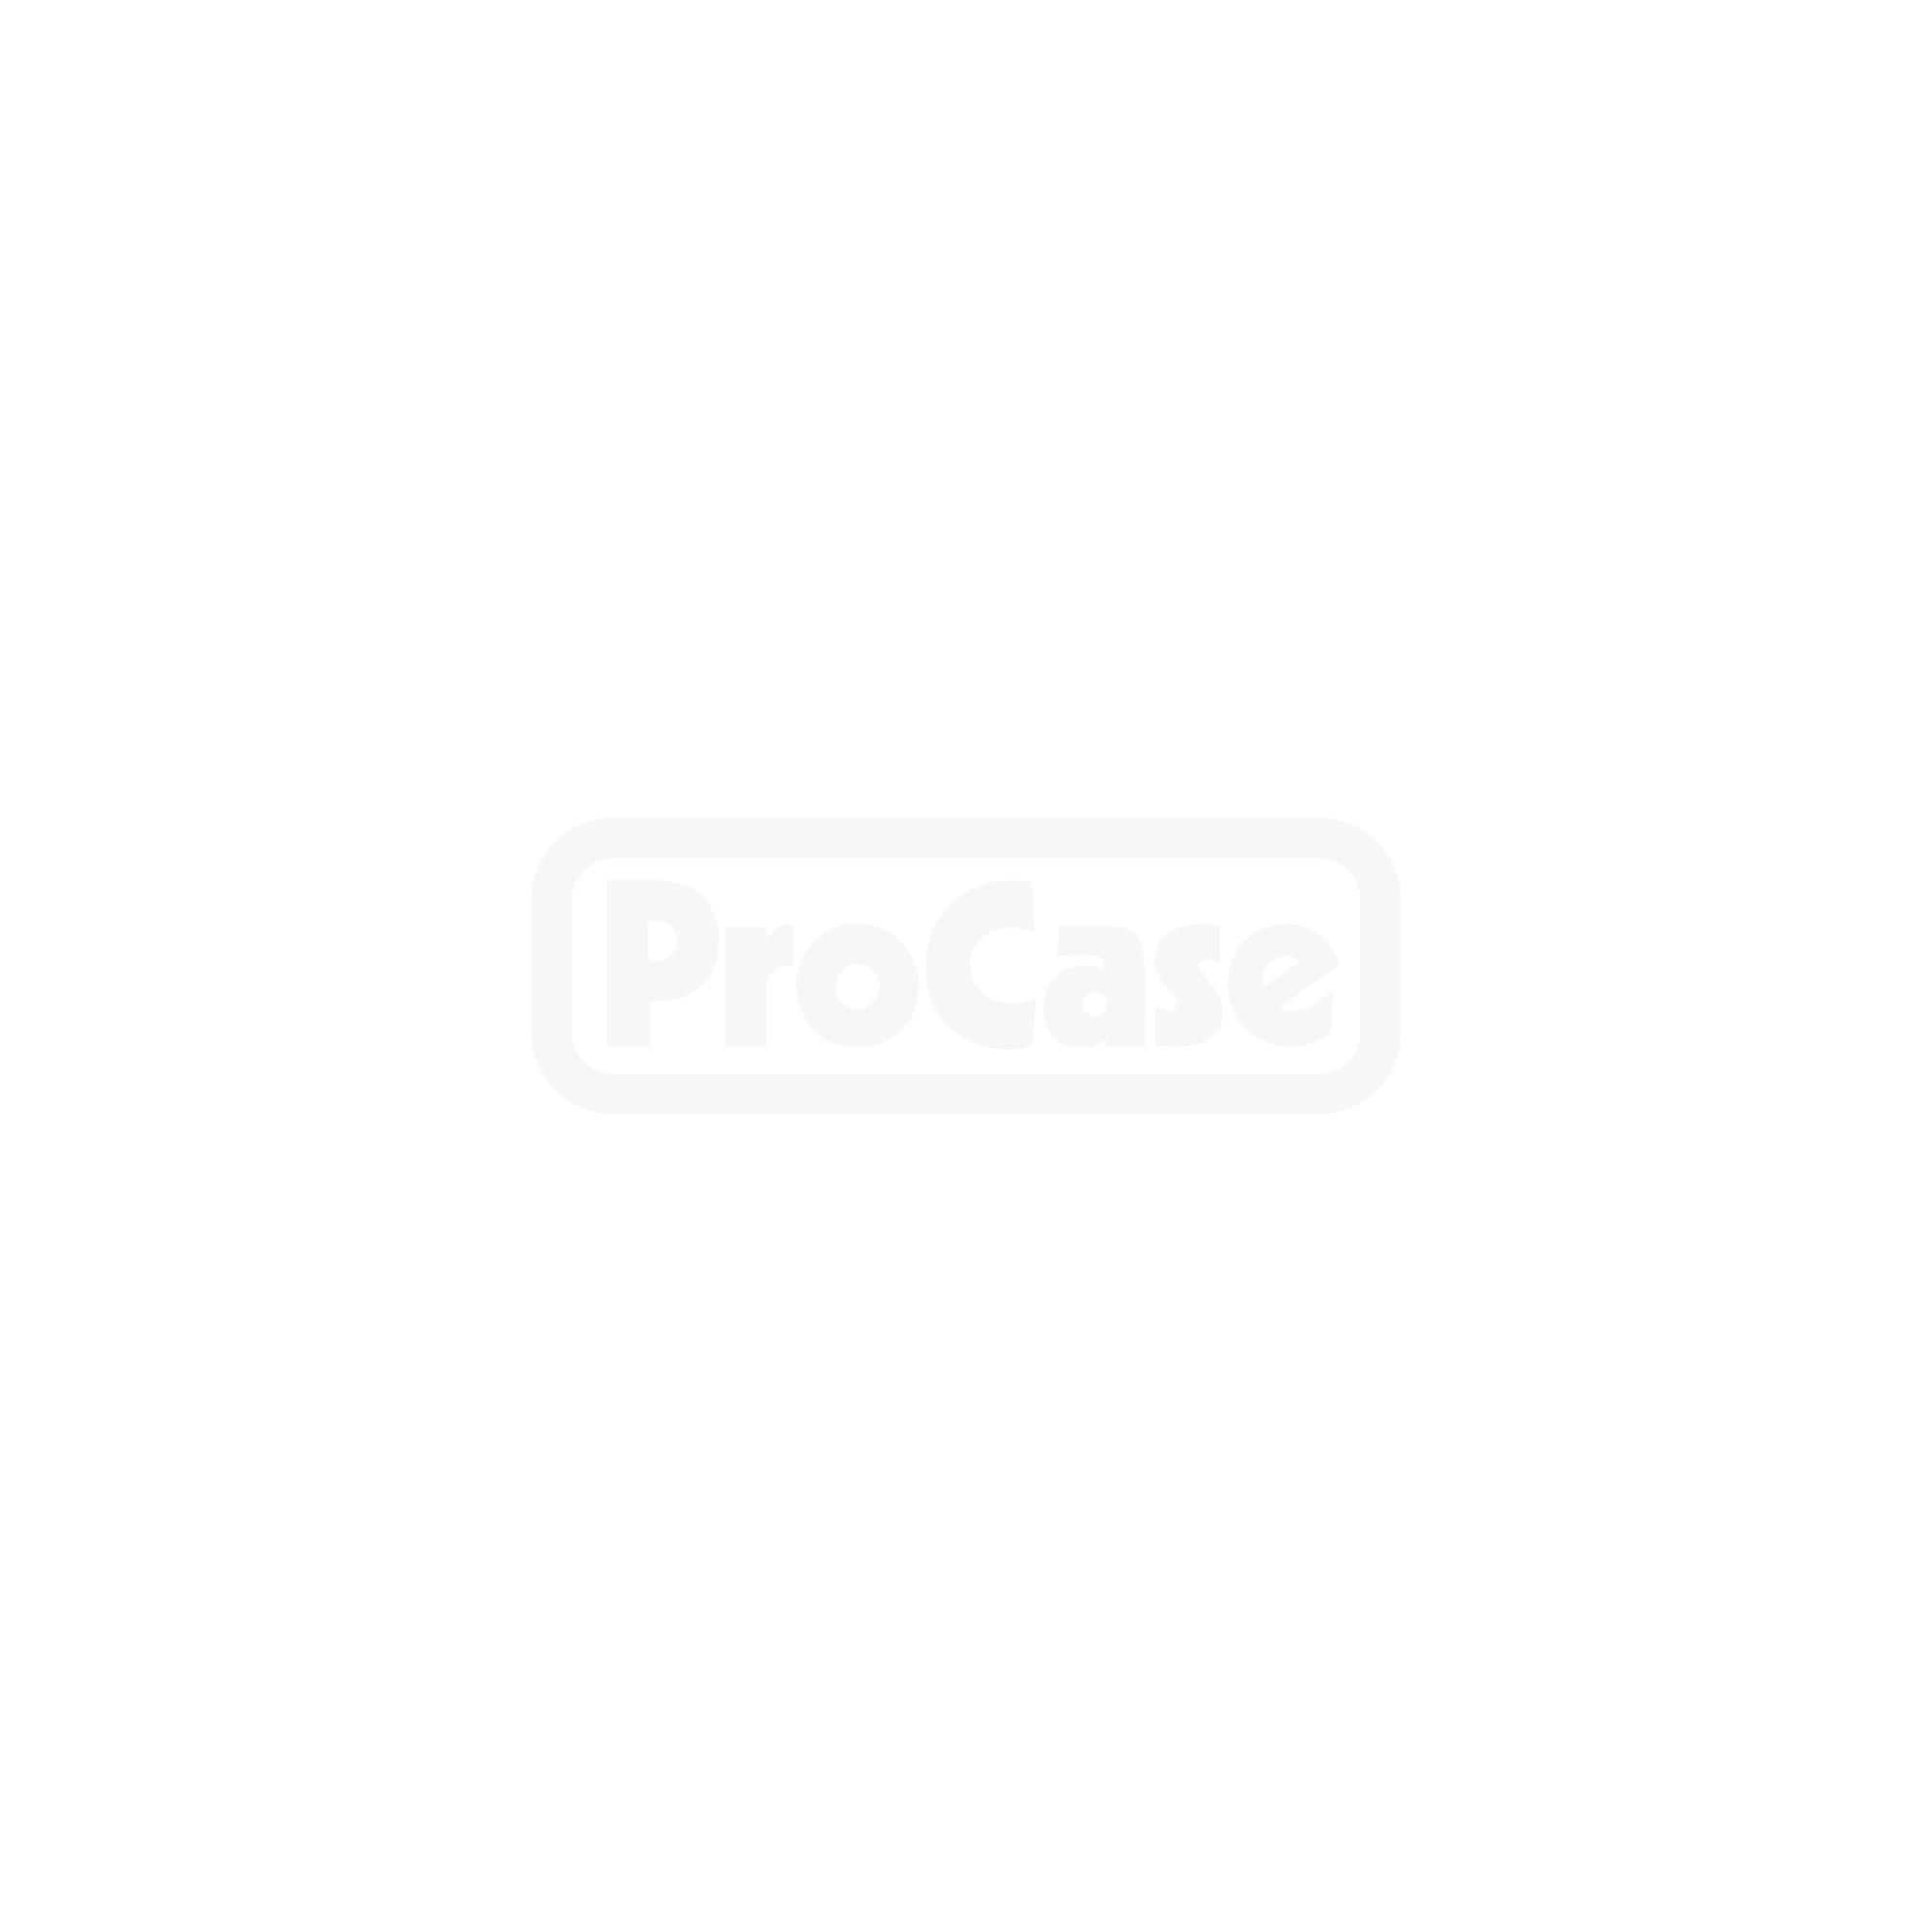 QSD Doppelrack 2.0 - 2x 20HE 600 tief